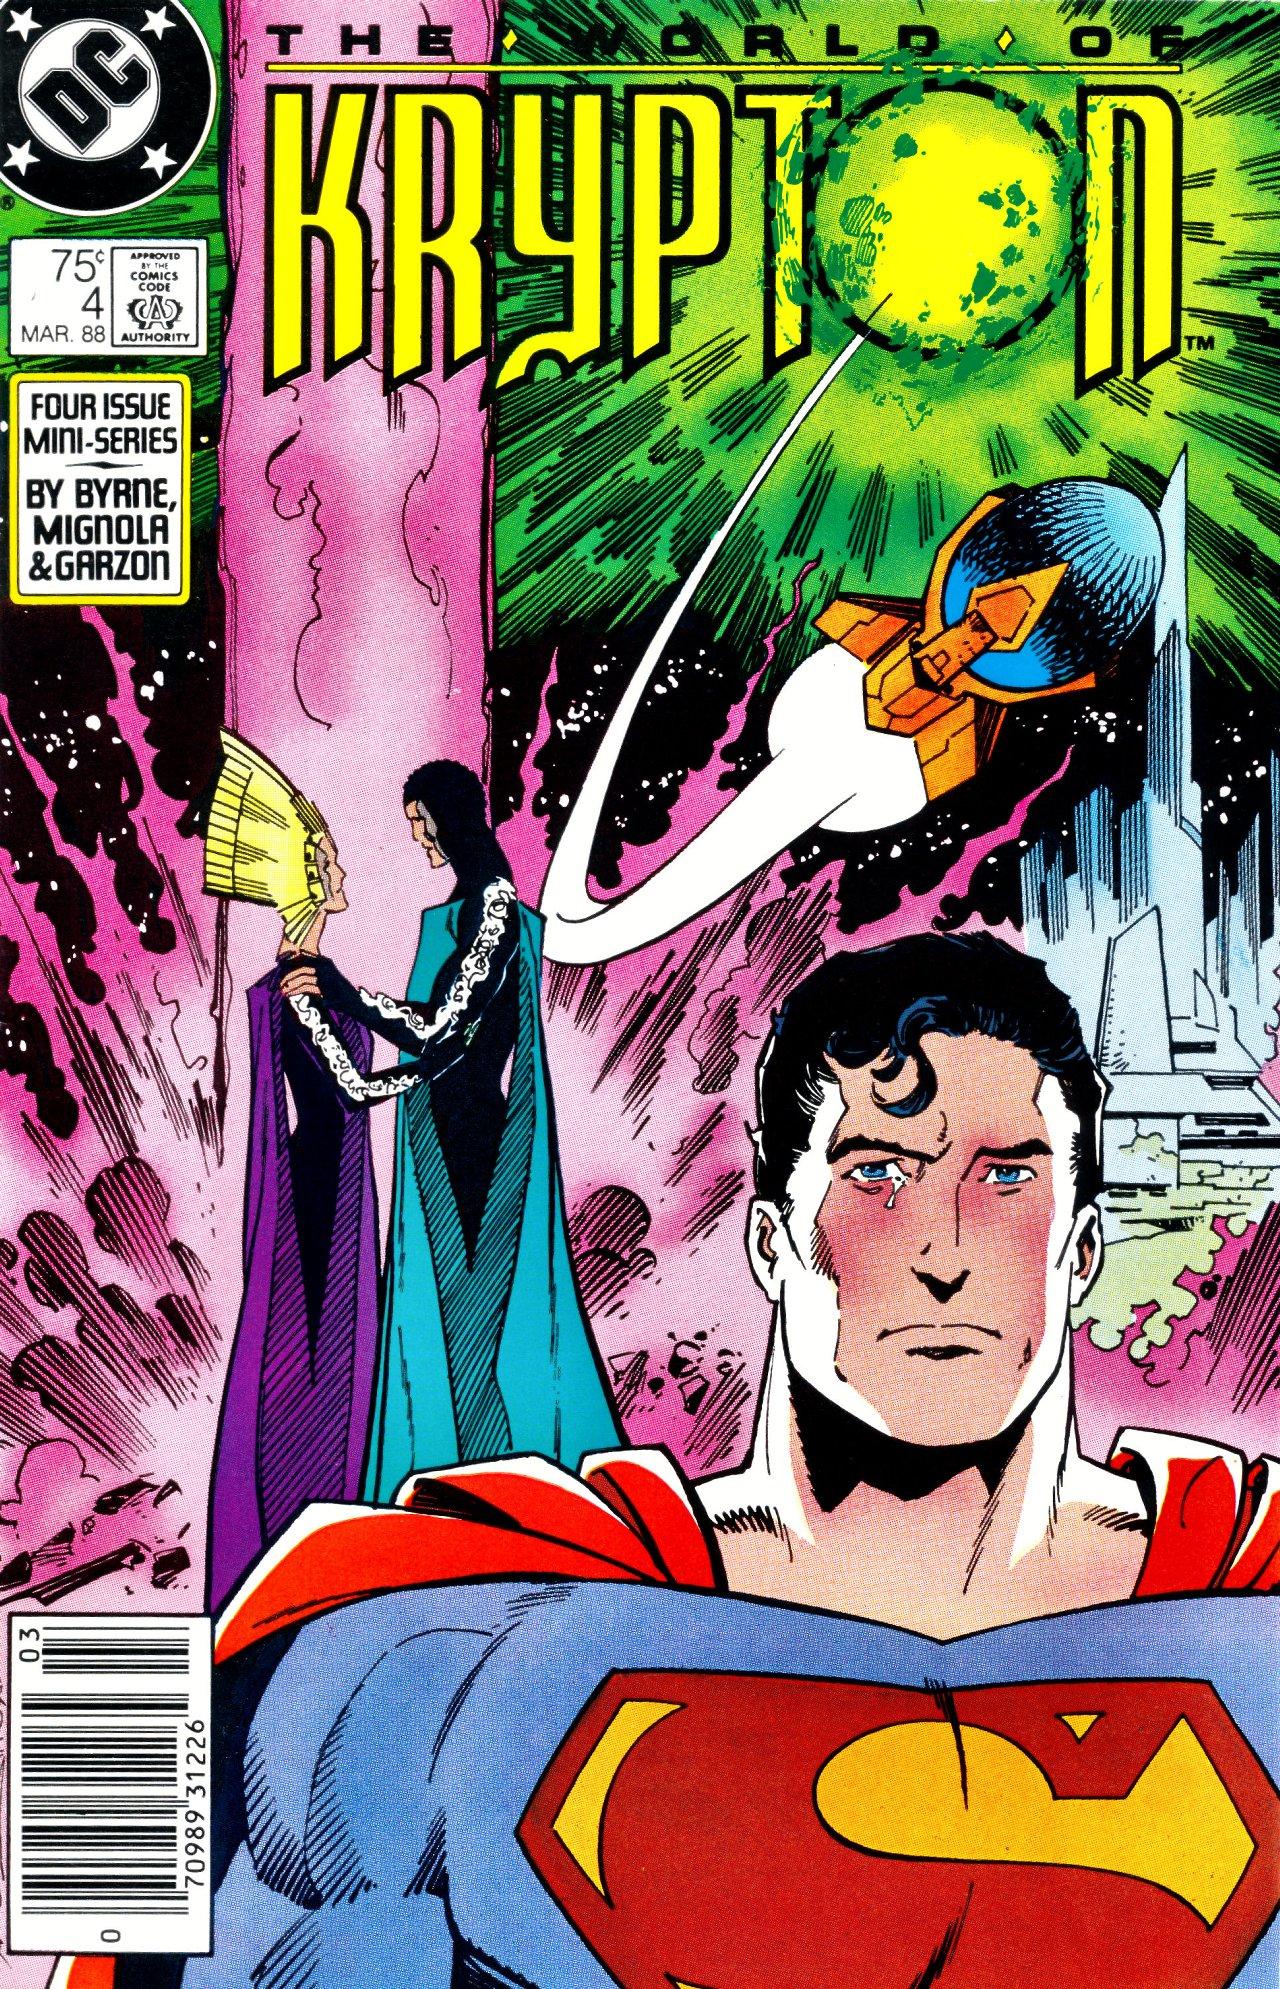 Read online World of Krypton comic -  Issue #4 - 2